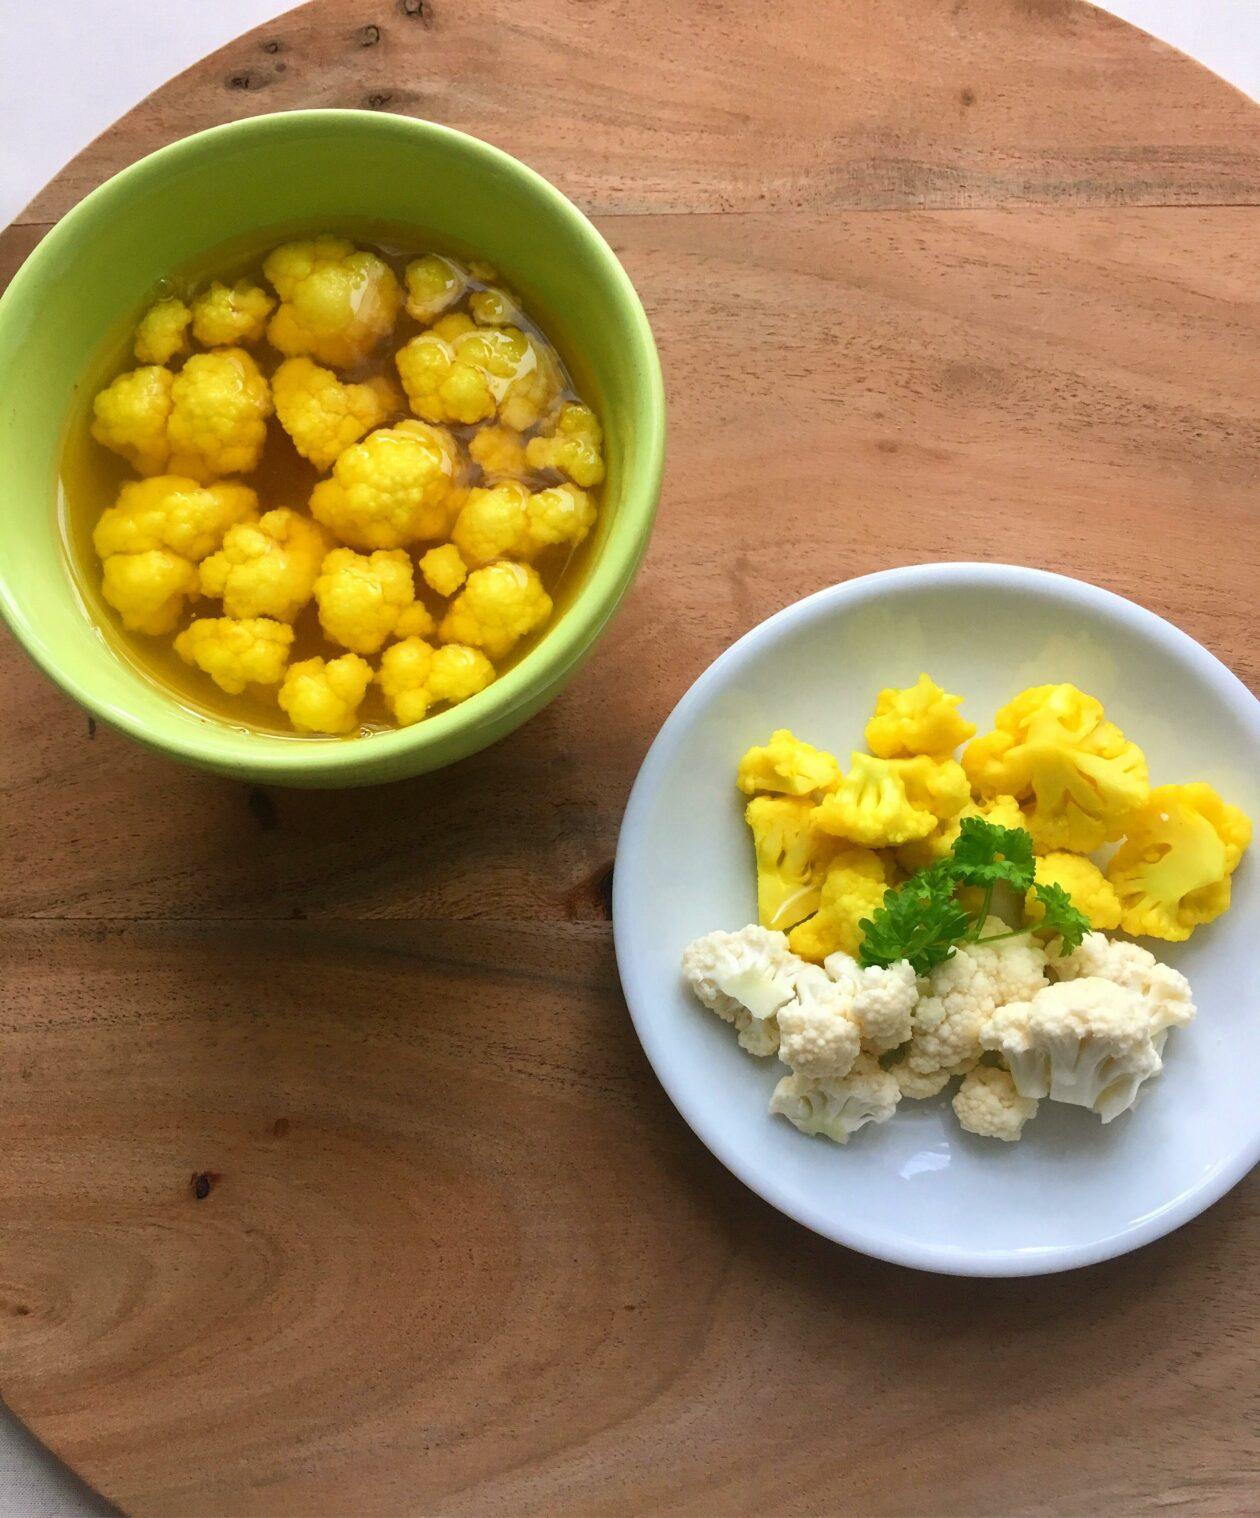 Blomkål med gurkemeje